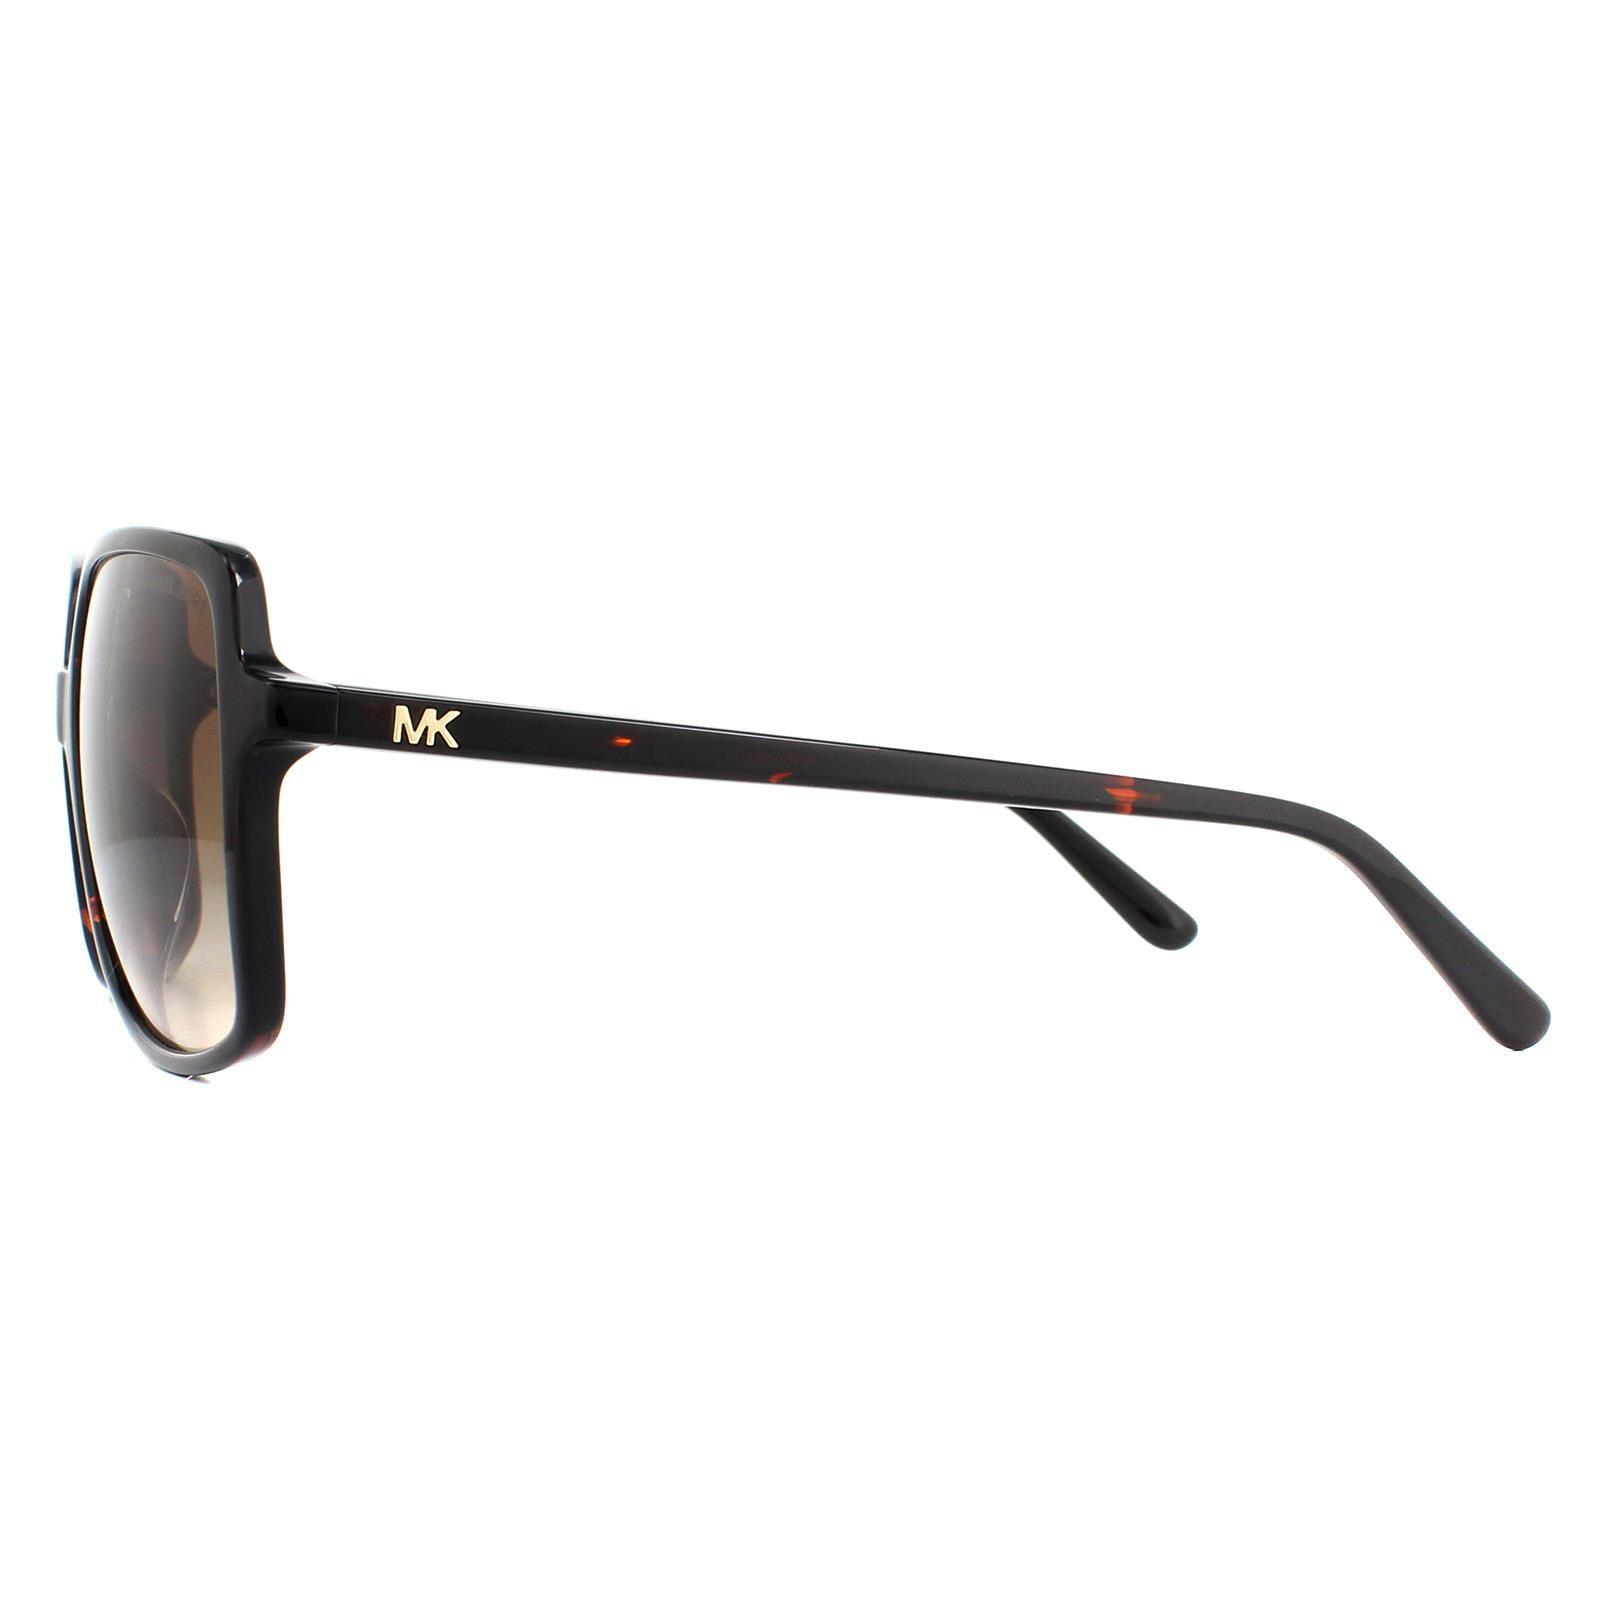 Michael Kors Sunglasses Isle of Palms MK2098U 378113 Dark Tortoise Smoke Gradient